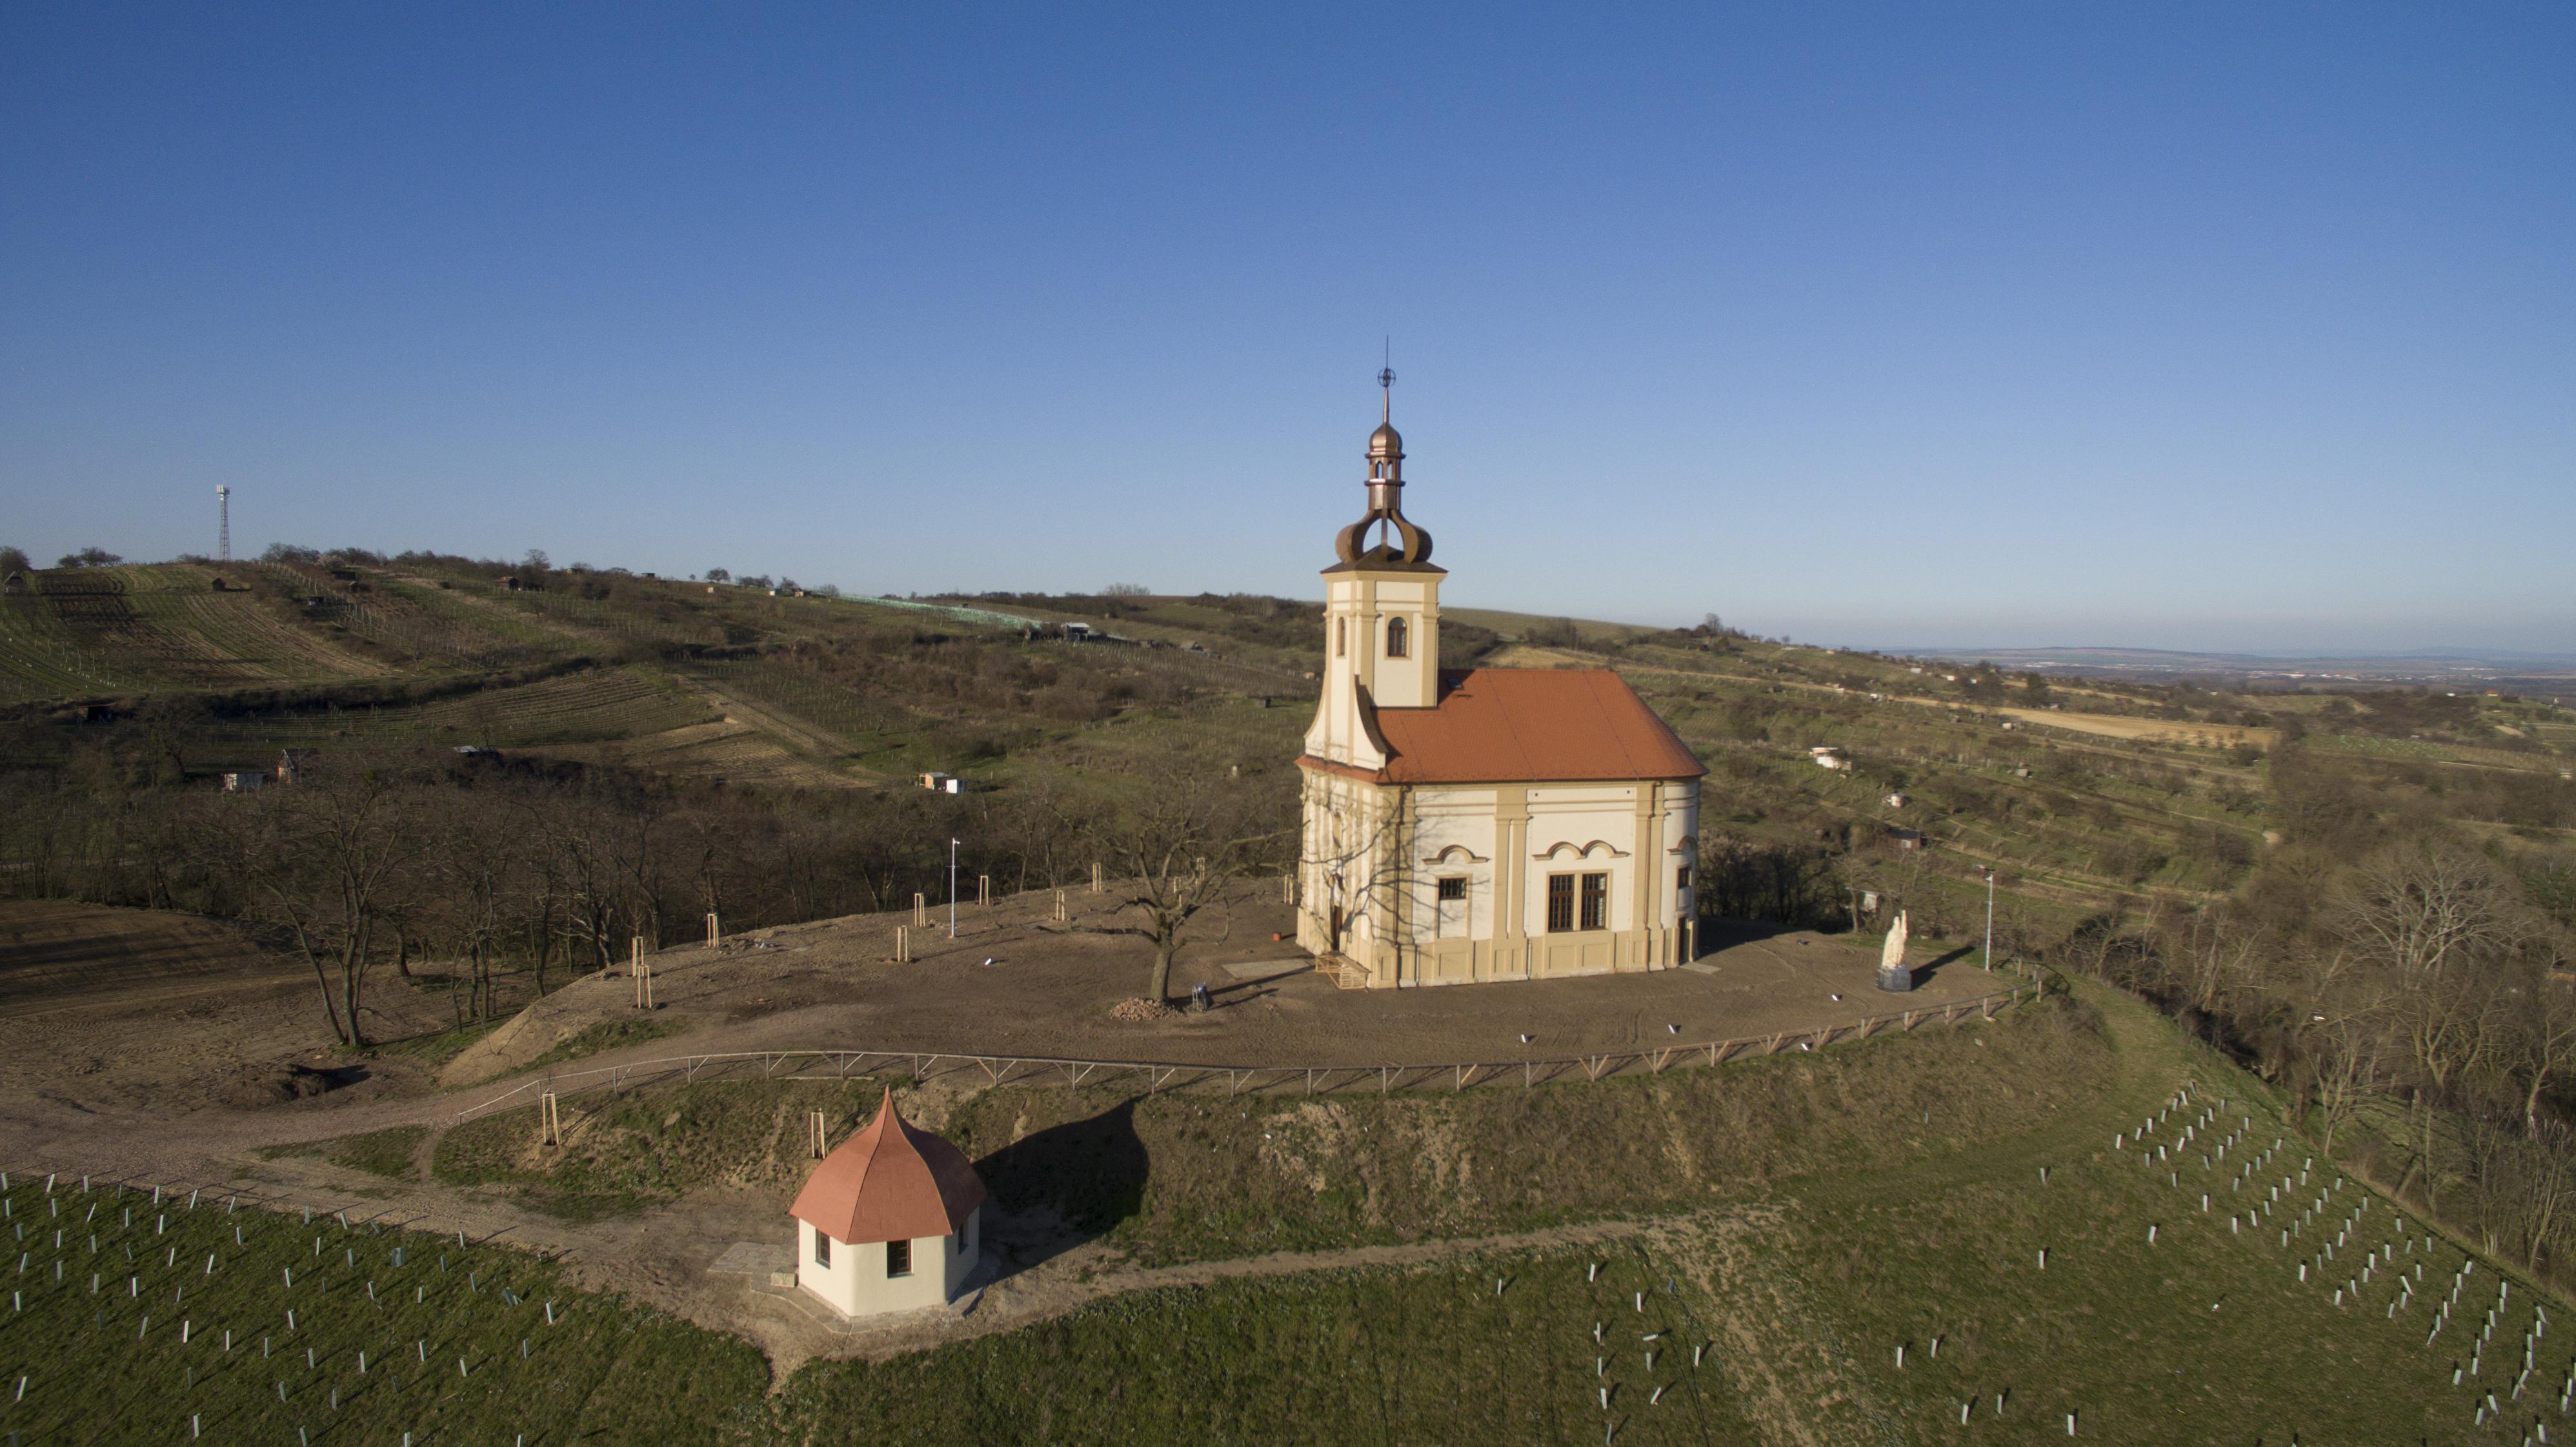 Kaple sv. Floriána a sv. Šebestiána